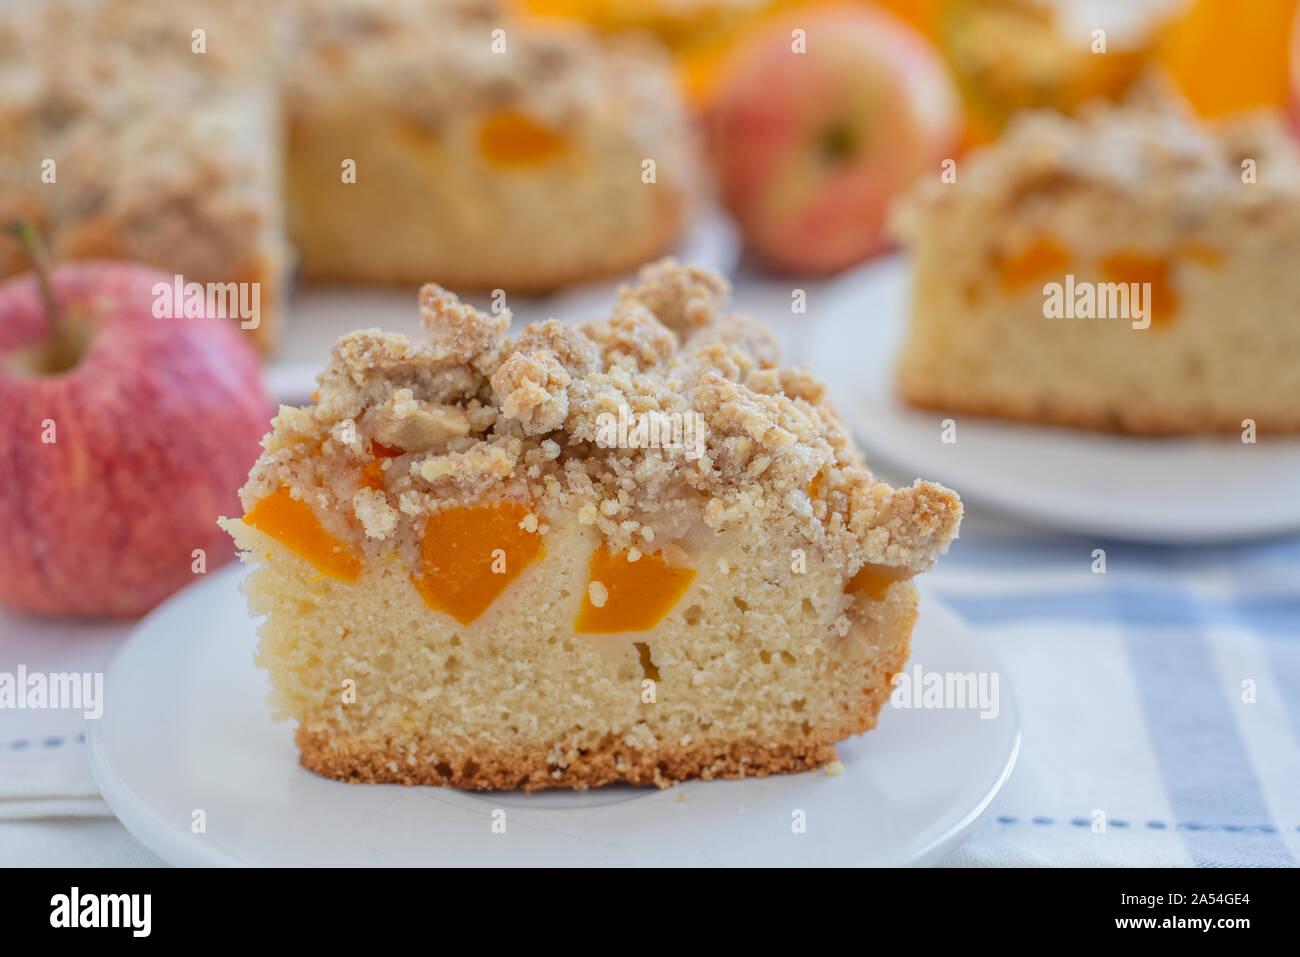 Home gemacht apple Kürbistorte Stockfoto